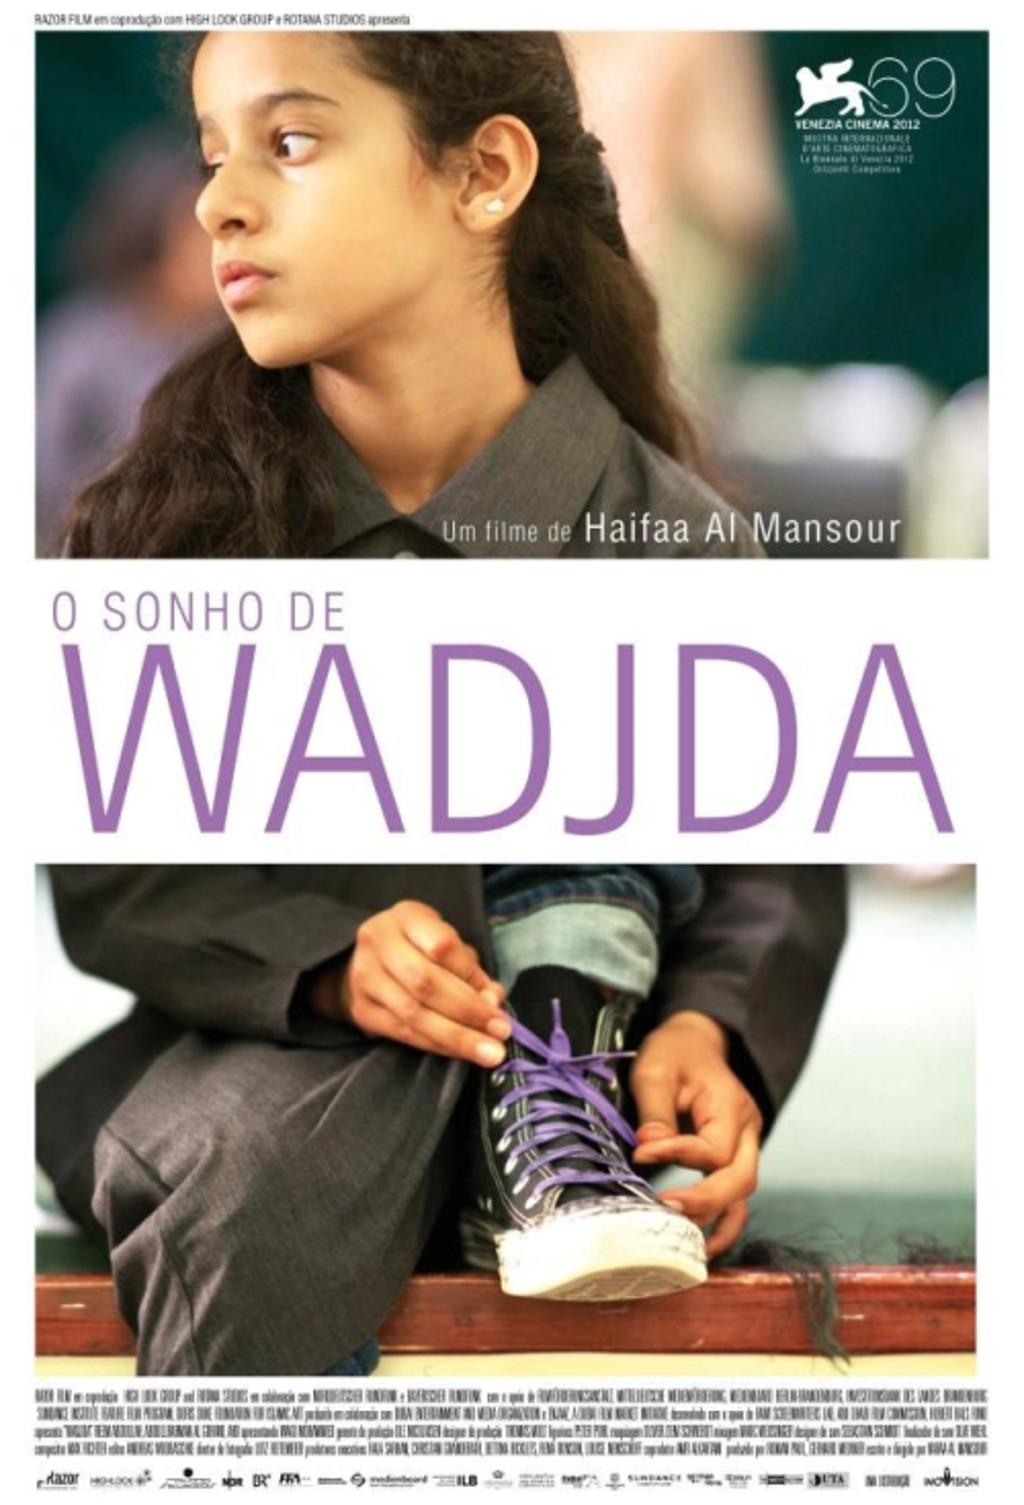 8-filmes-educativos-o-sonho-de-wadjda